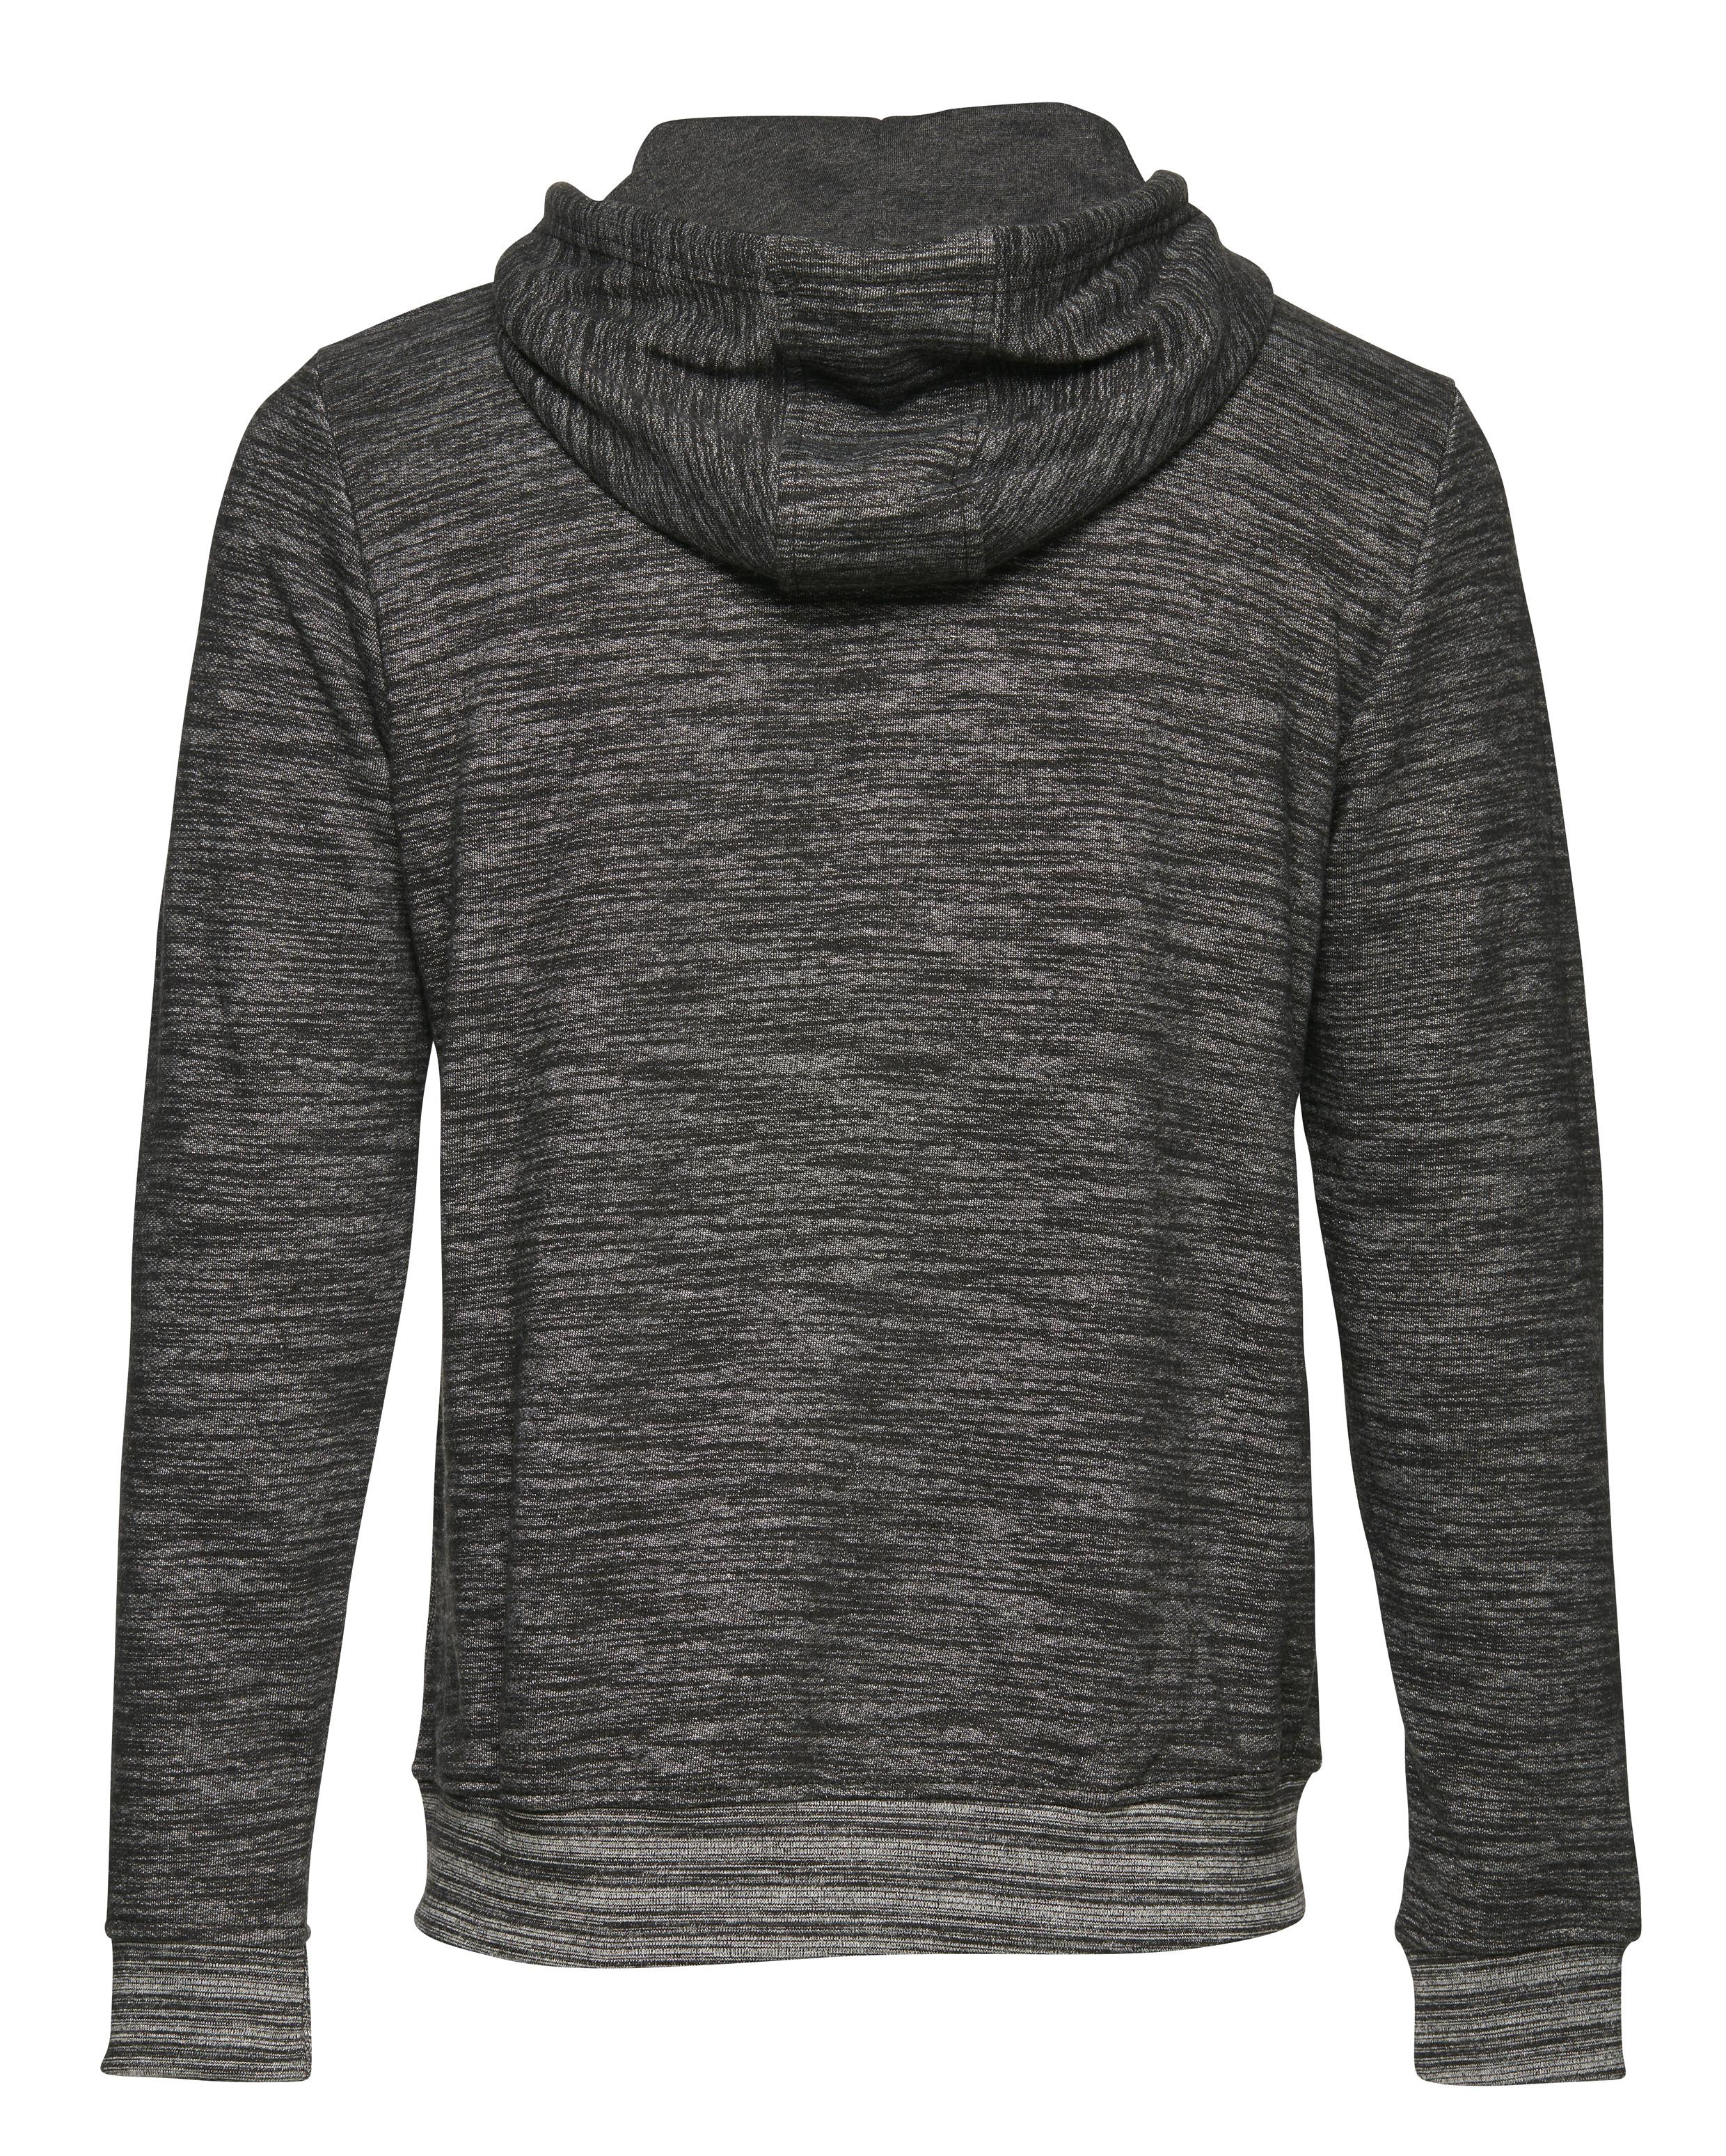 Charcoal Sweatshirt von Blend He – Shoppen Sie Charcoal Sweatshirt ab Gr. S-3XL hier